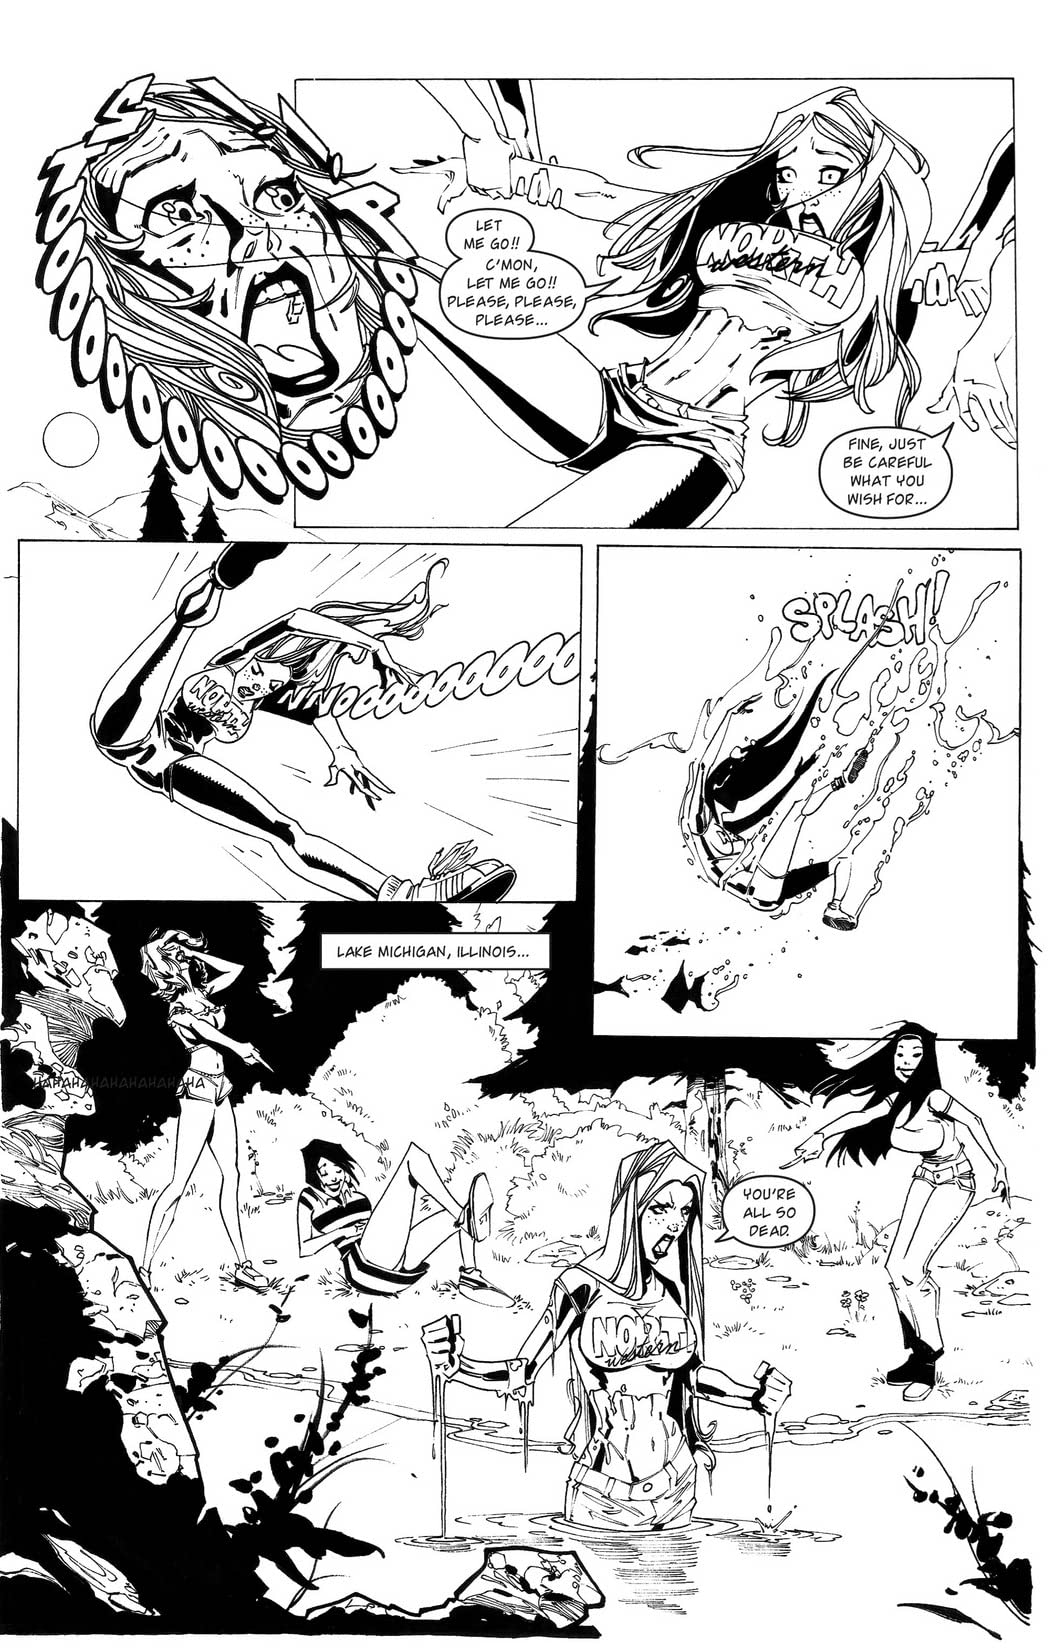 Mike Raicht's Creature Feature #1